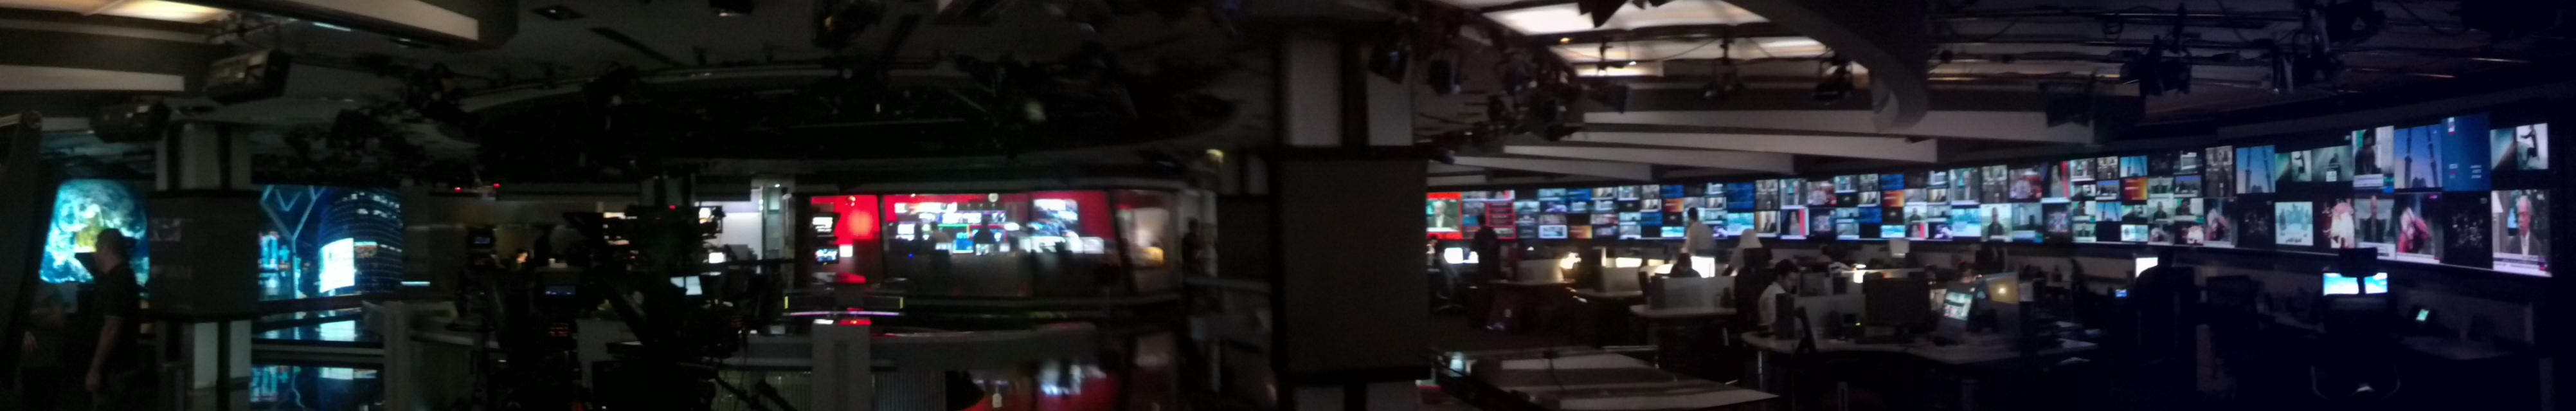 panoramic al arabiya earth hour lights off